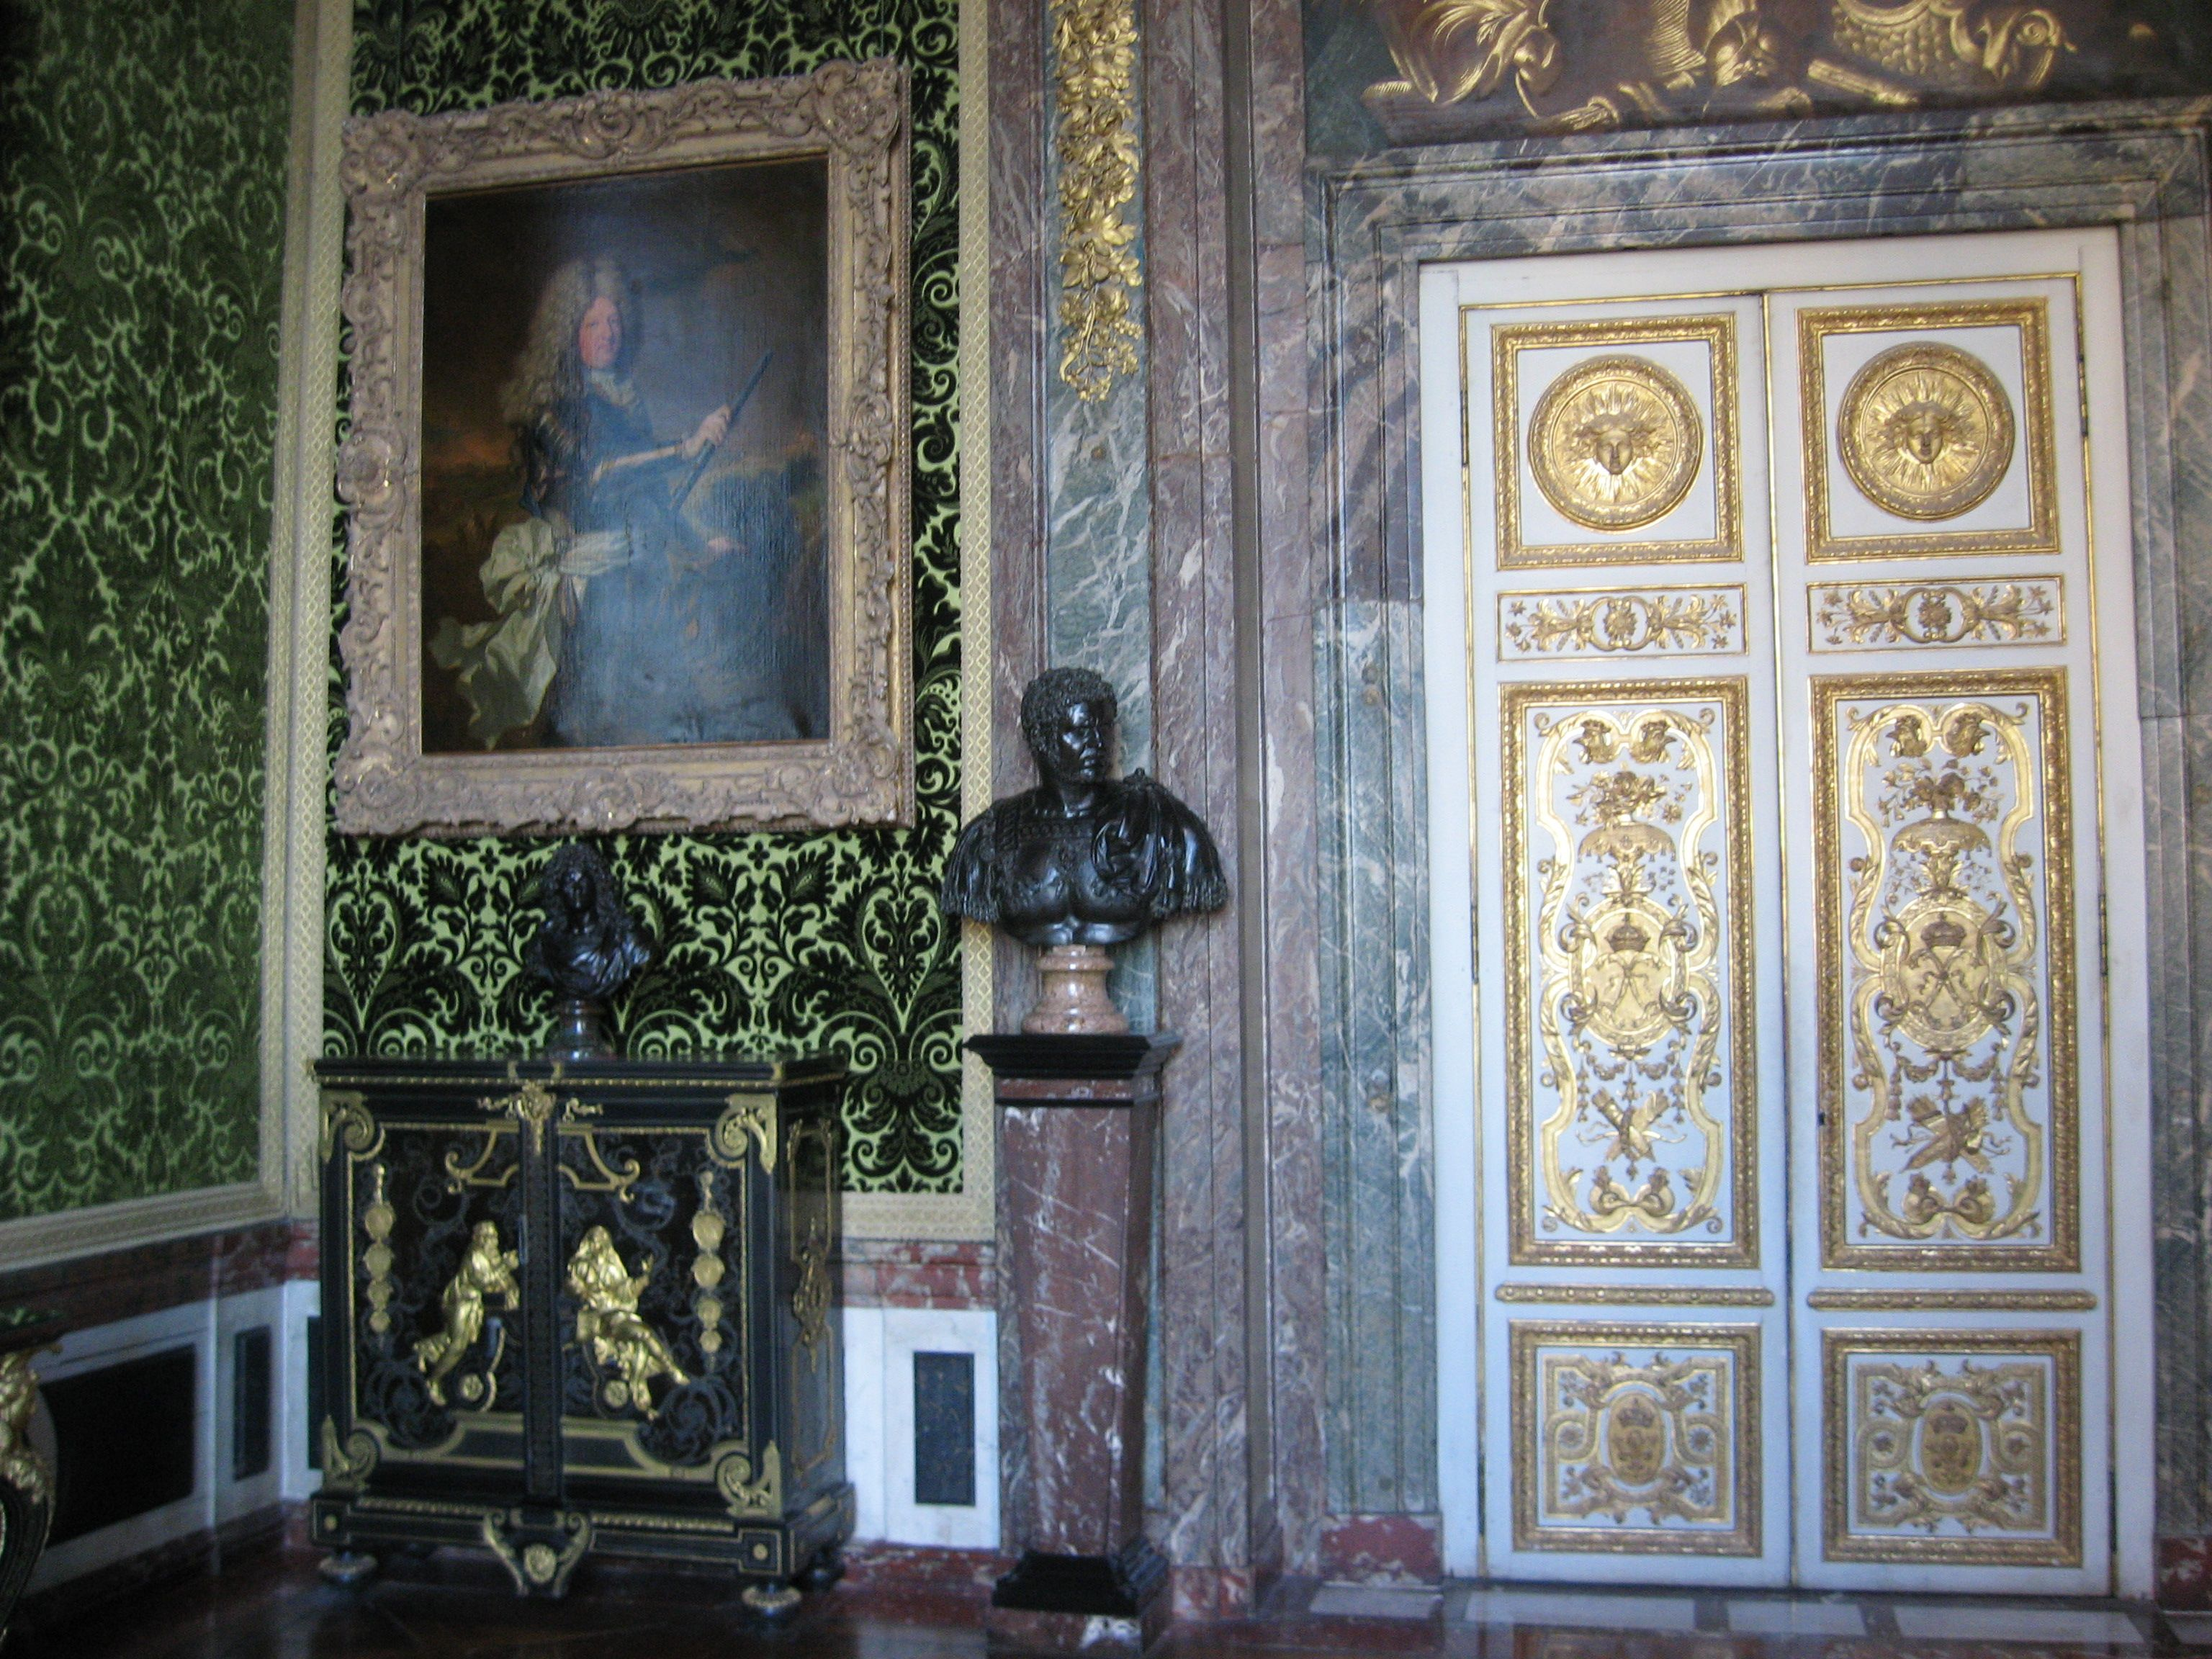 Louis XIV Decorative Arts